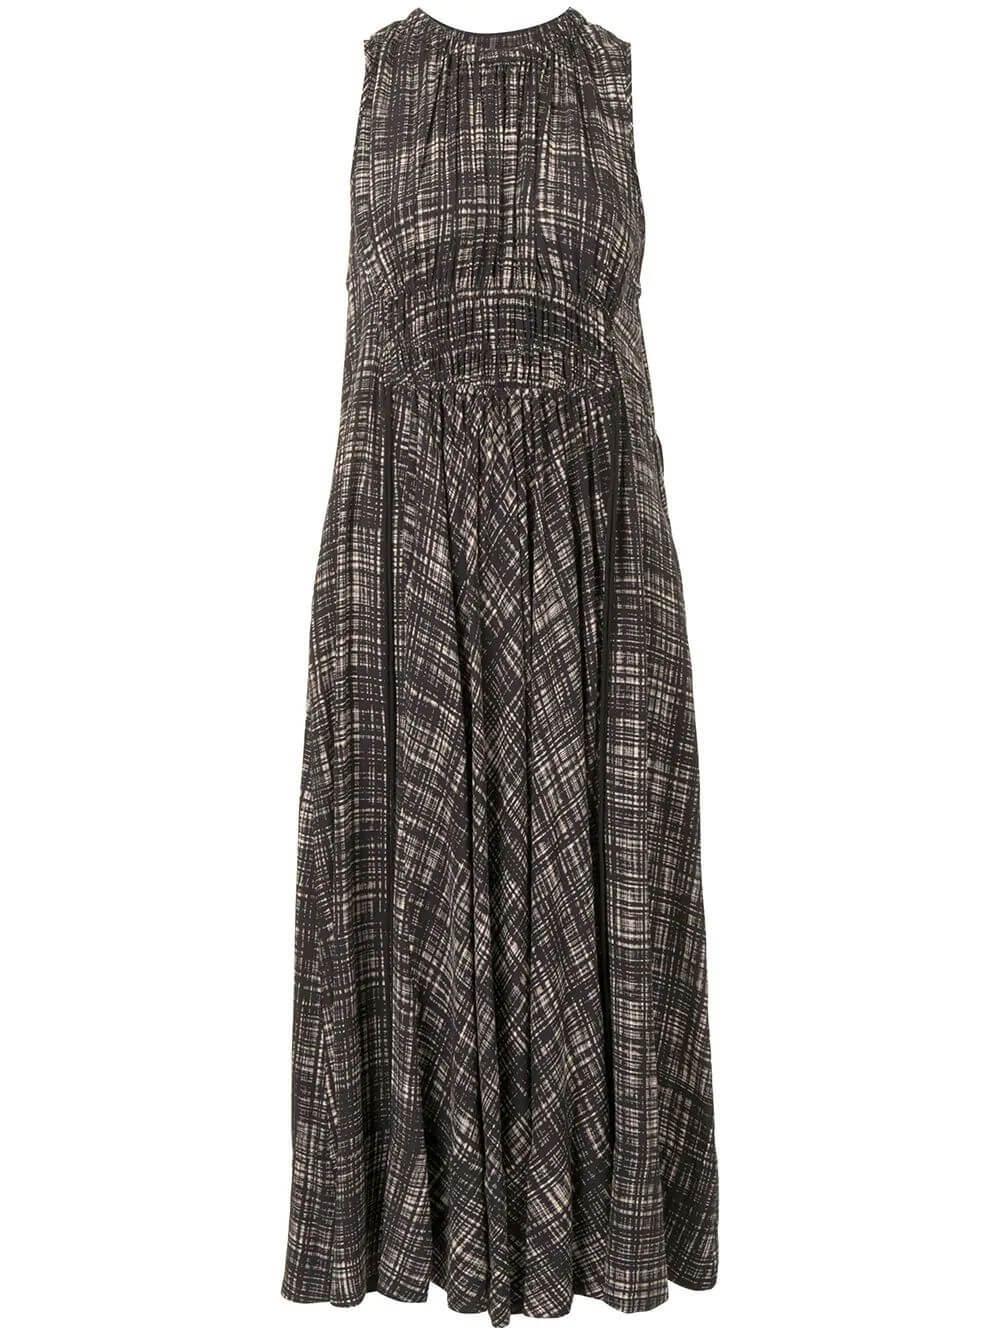 Printed Midi Dress Item # WL2123161